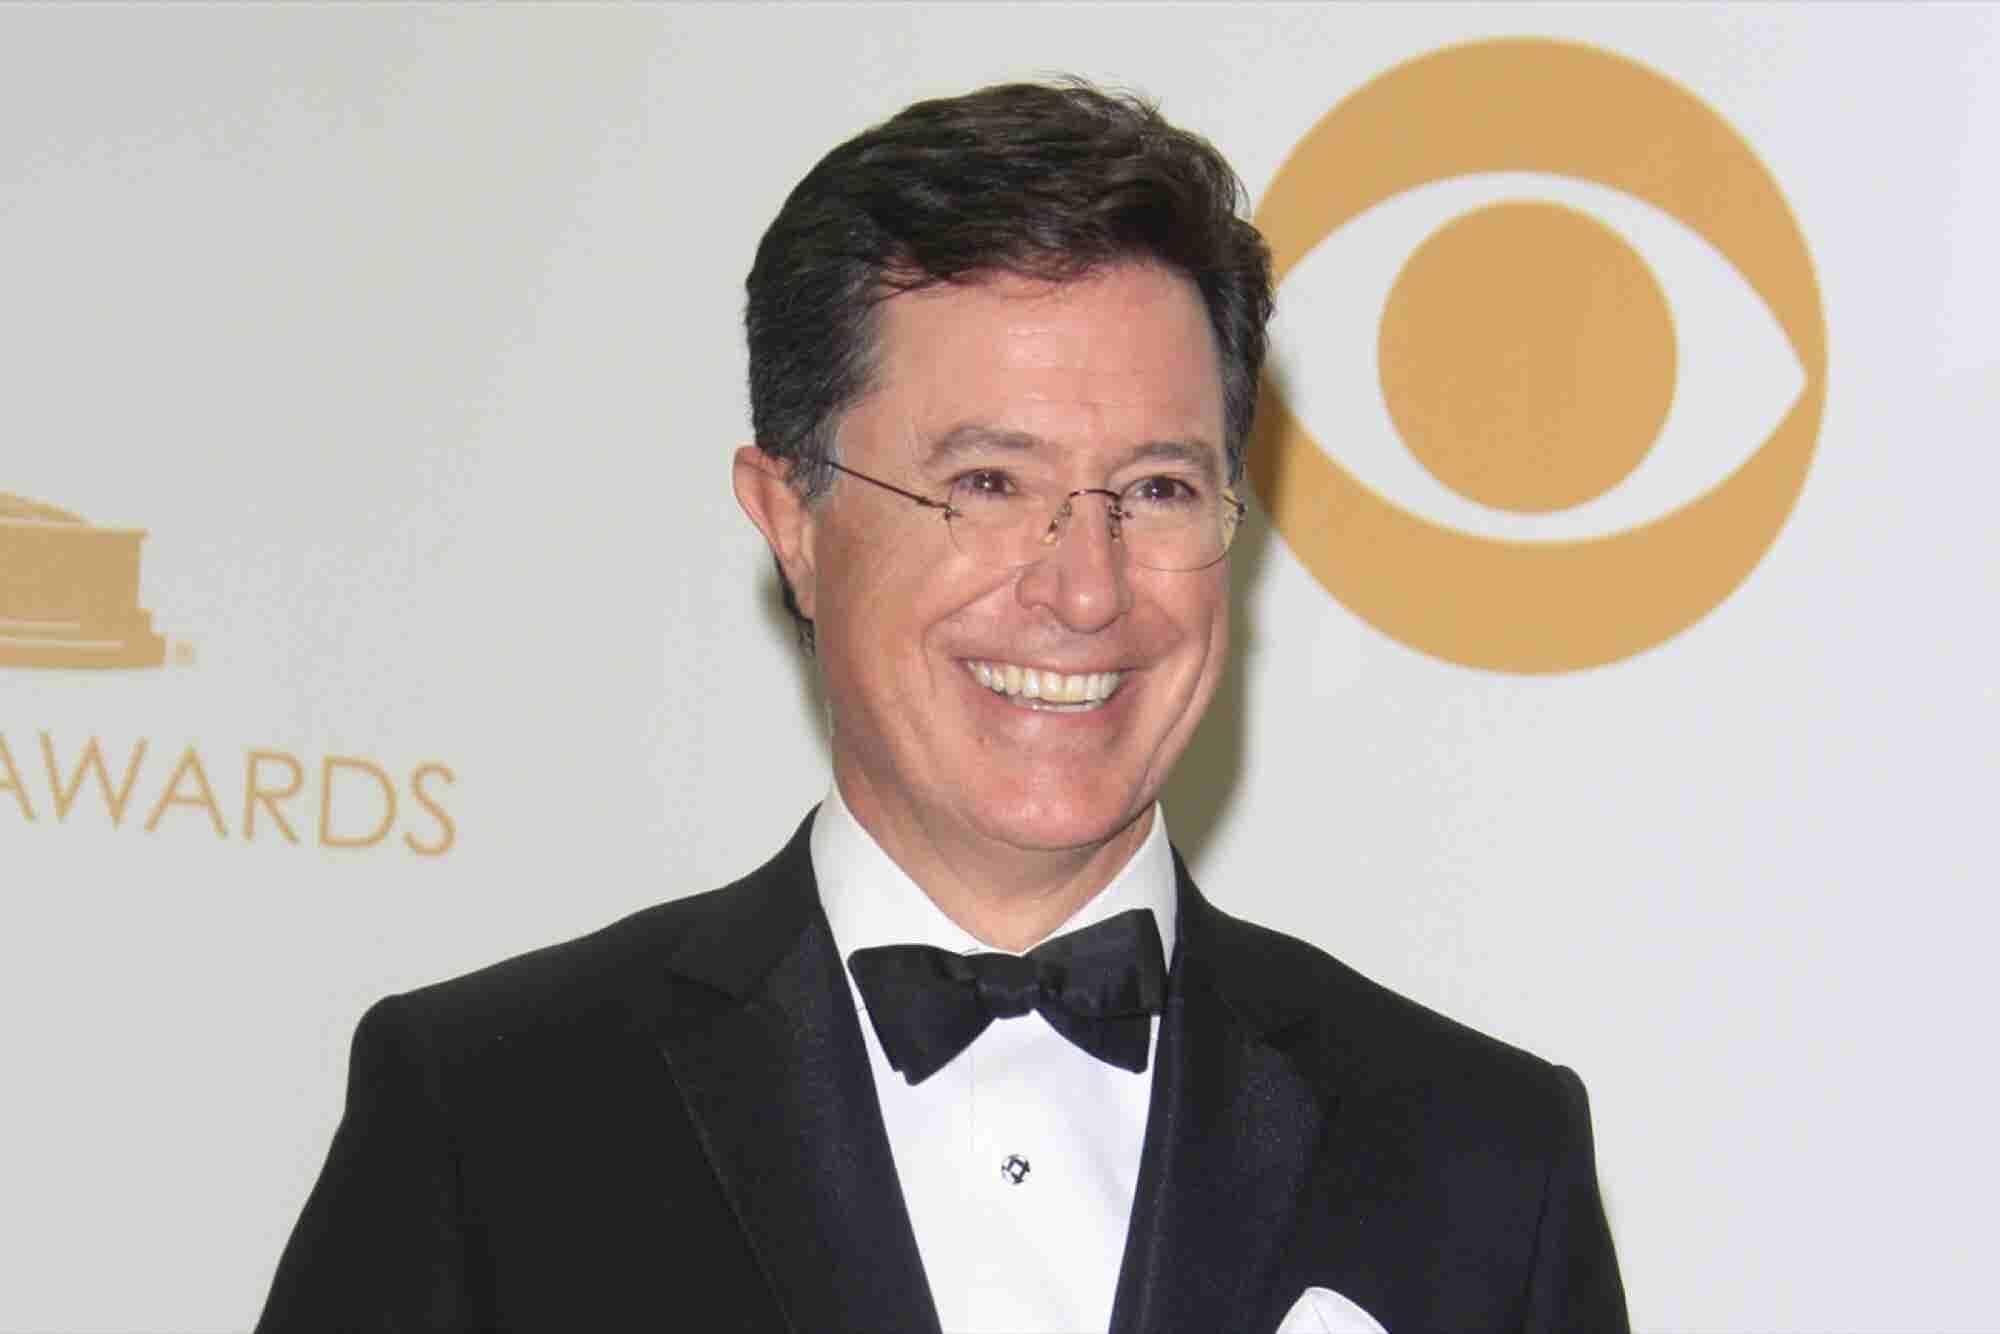 Stephen Colbert Skewers Reefer-Mad Canadians in Hilarious Video